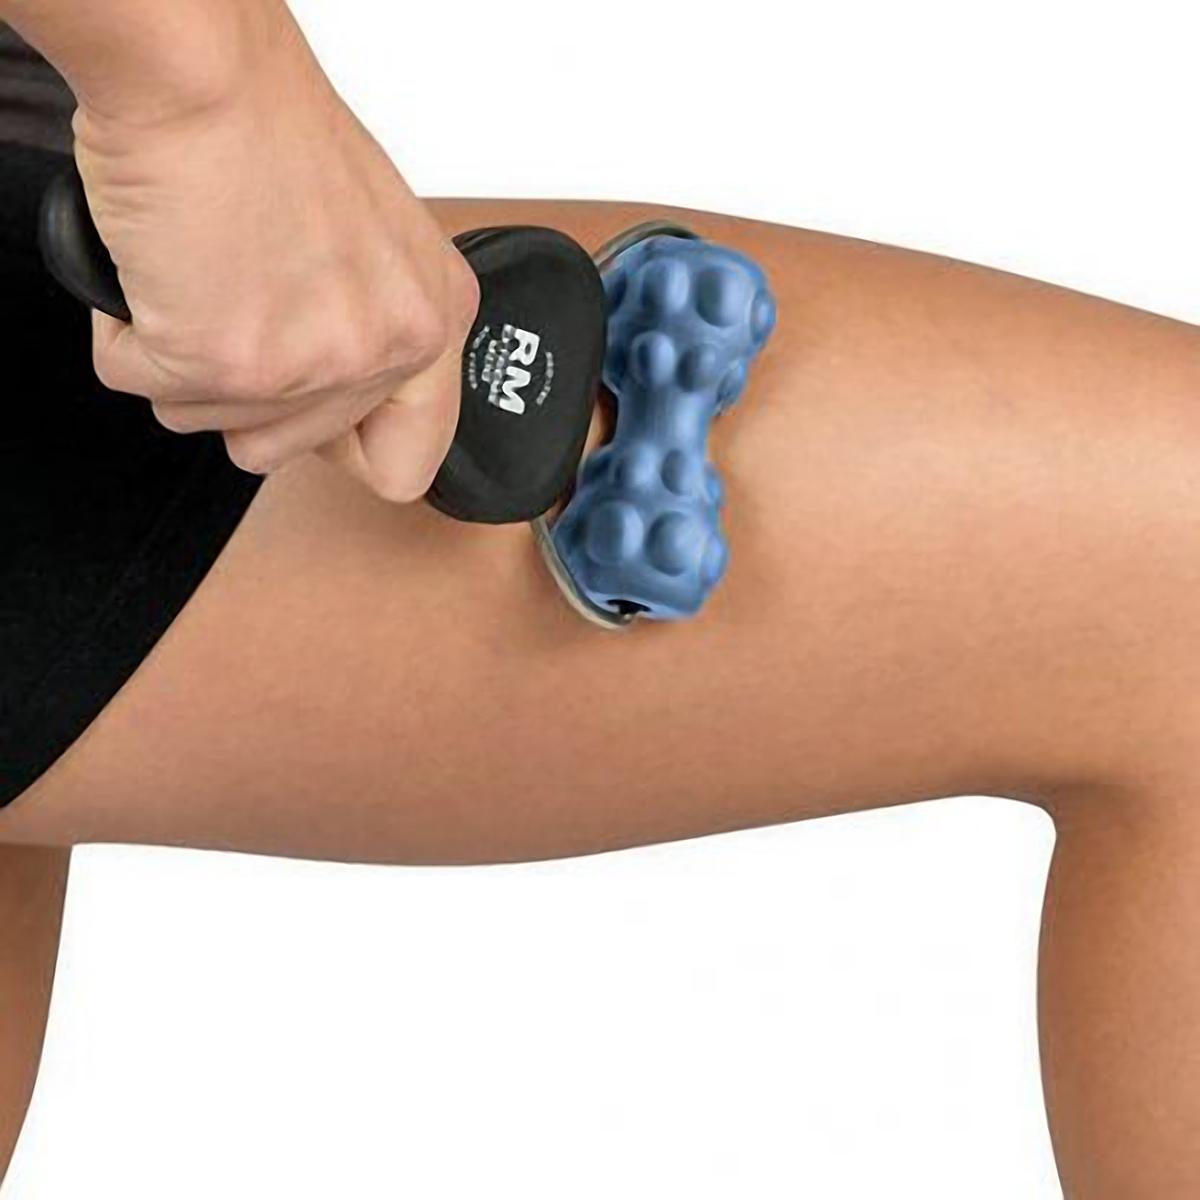 Pro-Tec RM Extreme Mini Roller - Color: Blue - Size: One Size, Blue, large, image 2